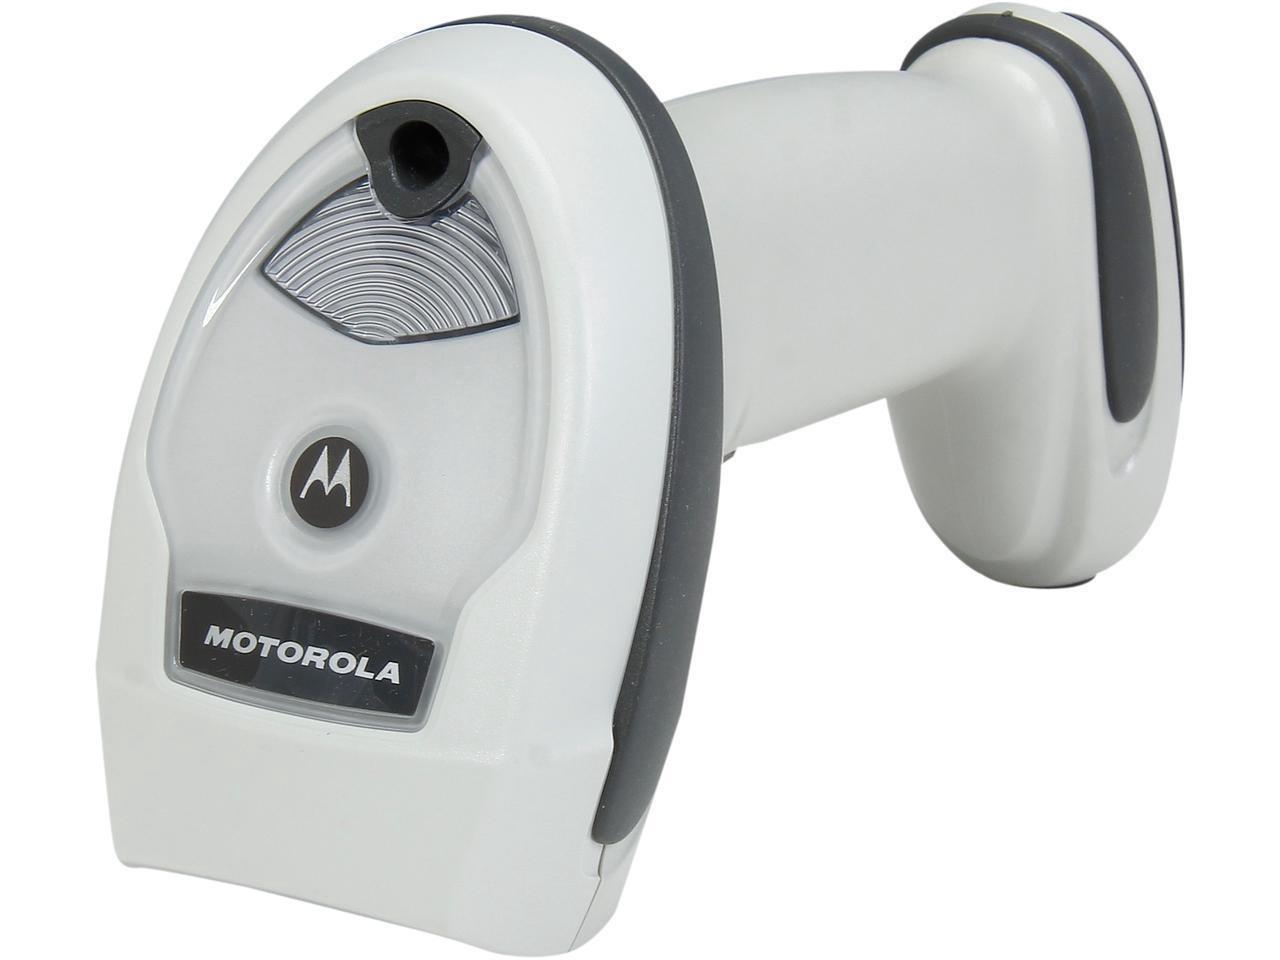 Motorola LI4278 Scanner Wireless BlueTooth White (Scanner Only) LI4278-SR20001WR